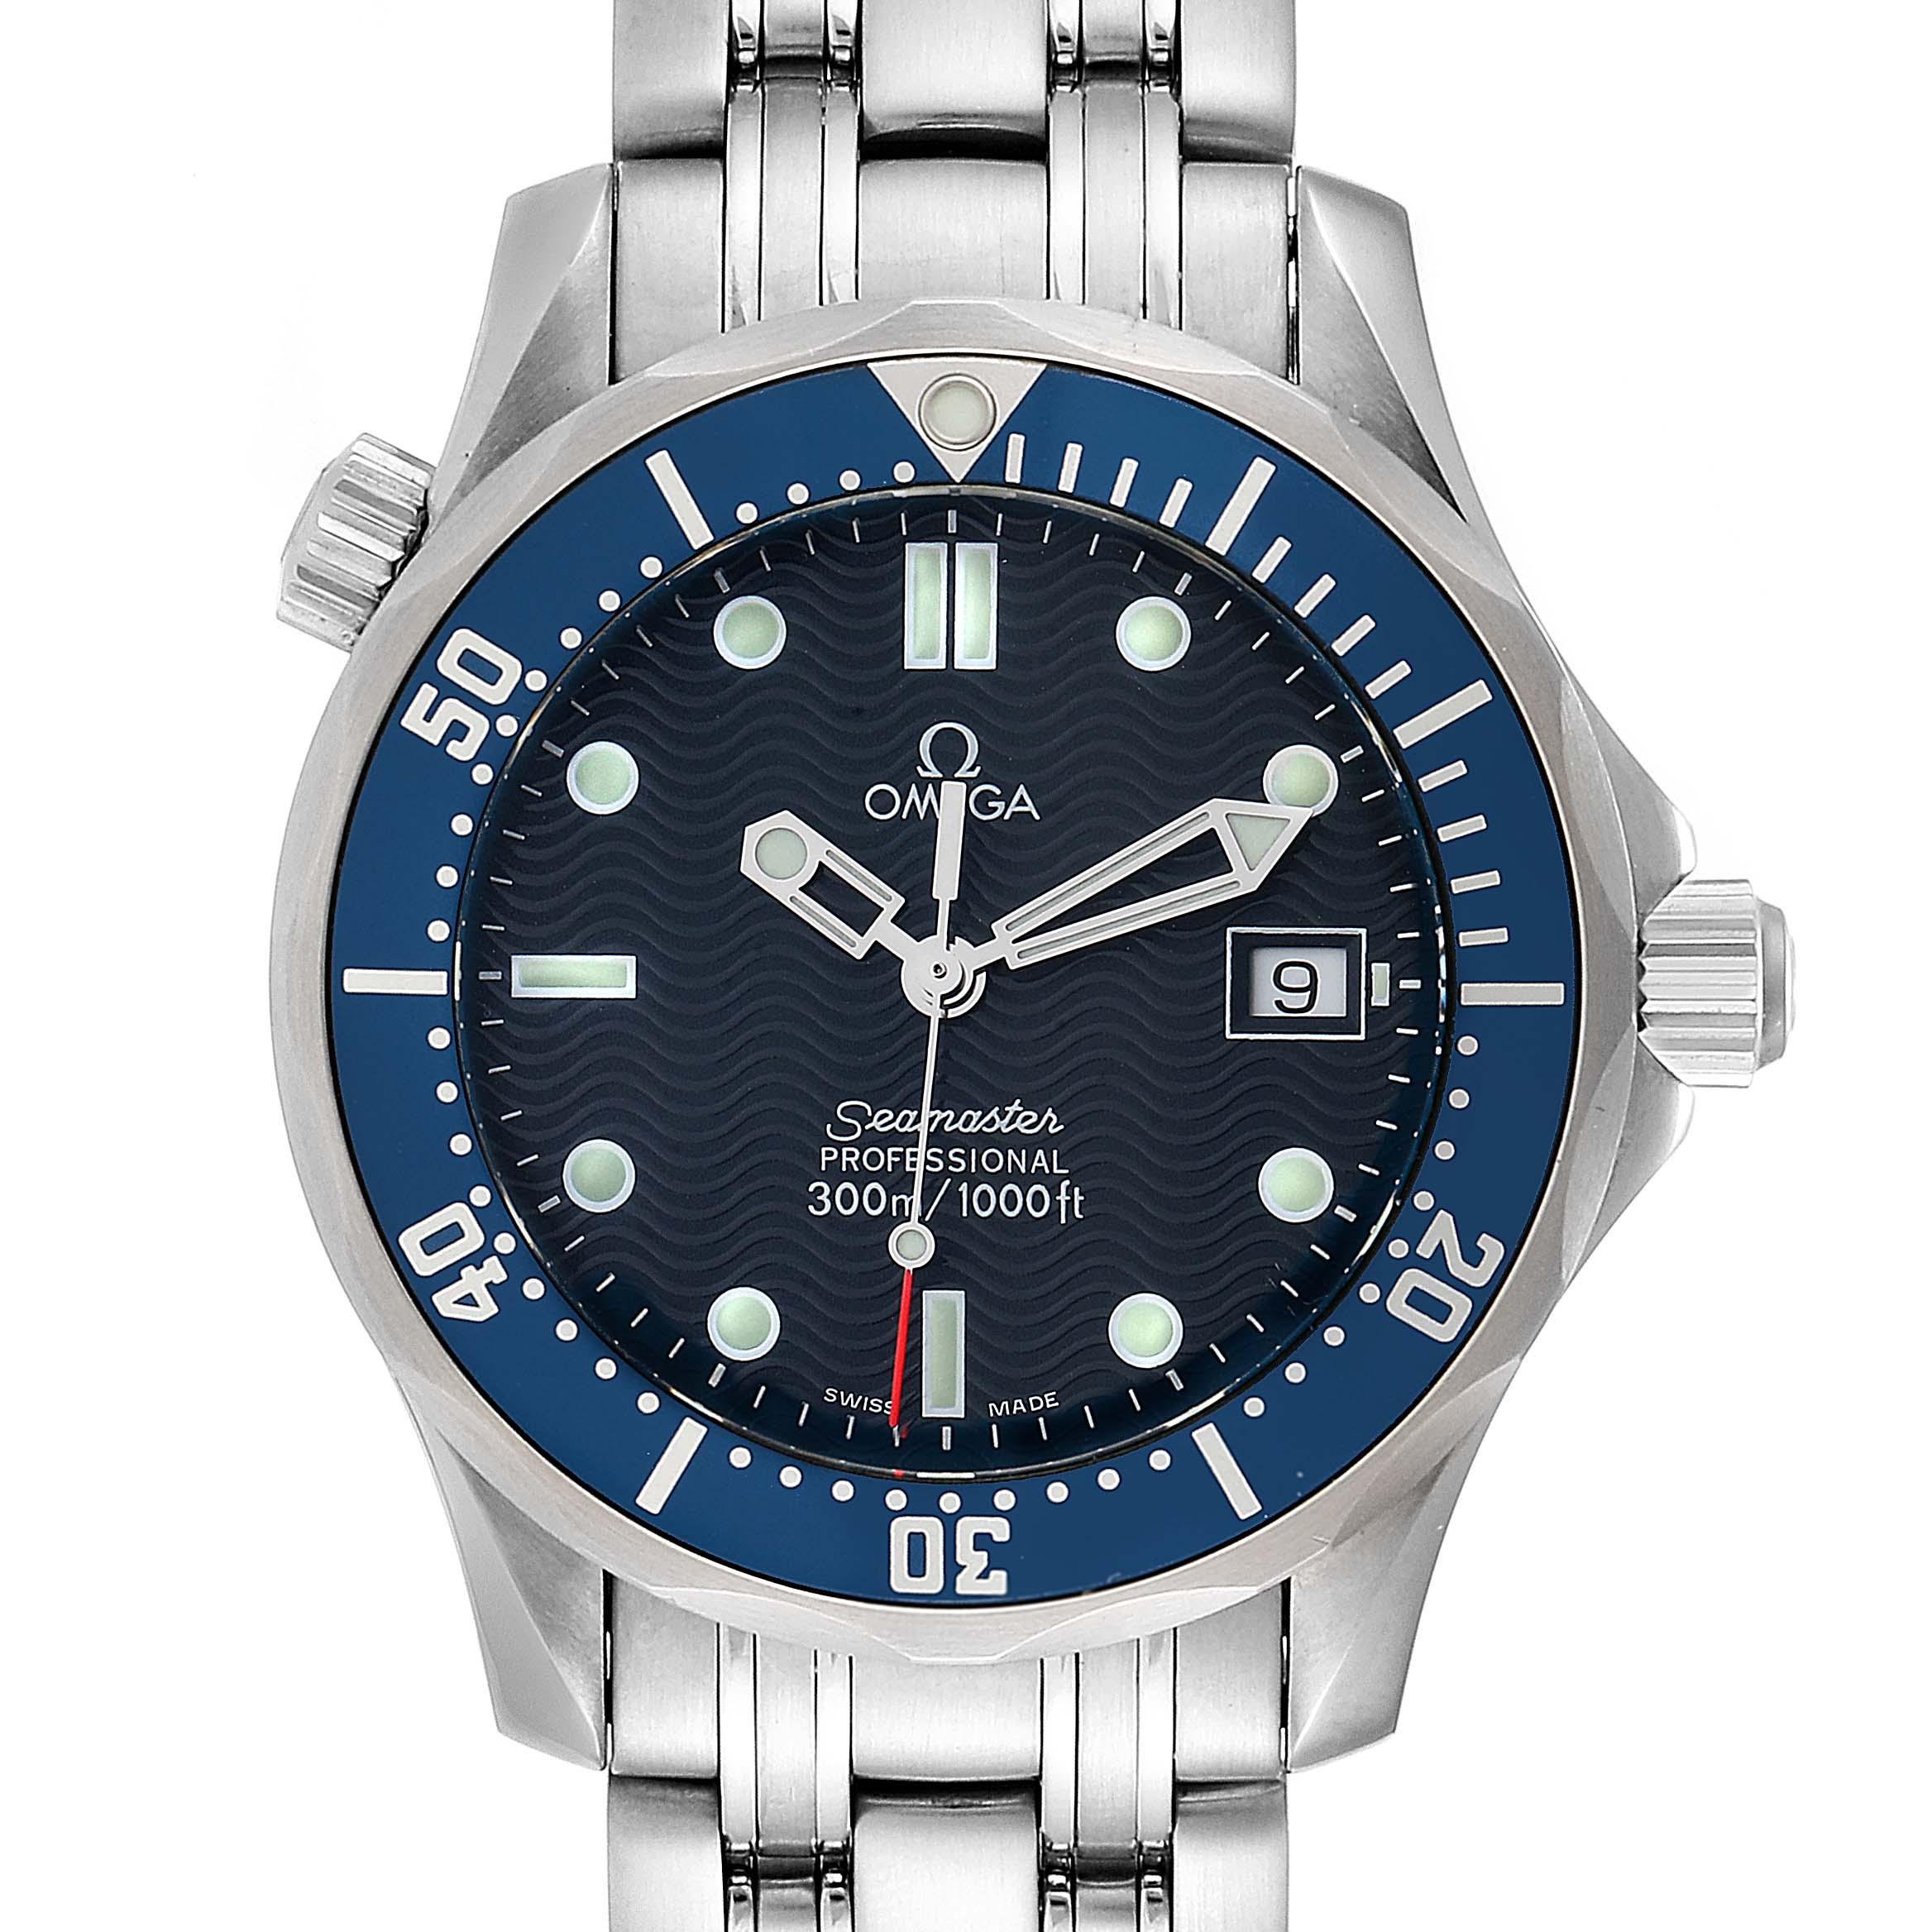 Omega Seamaster Bond 36 Midsize Blue Dial Watch 2561.80.00 Box Card